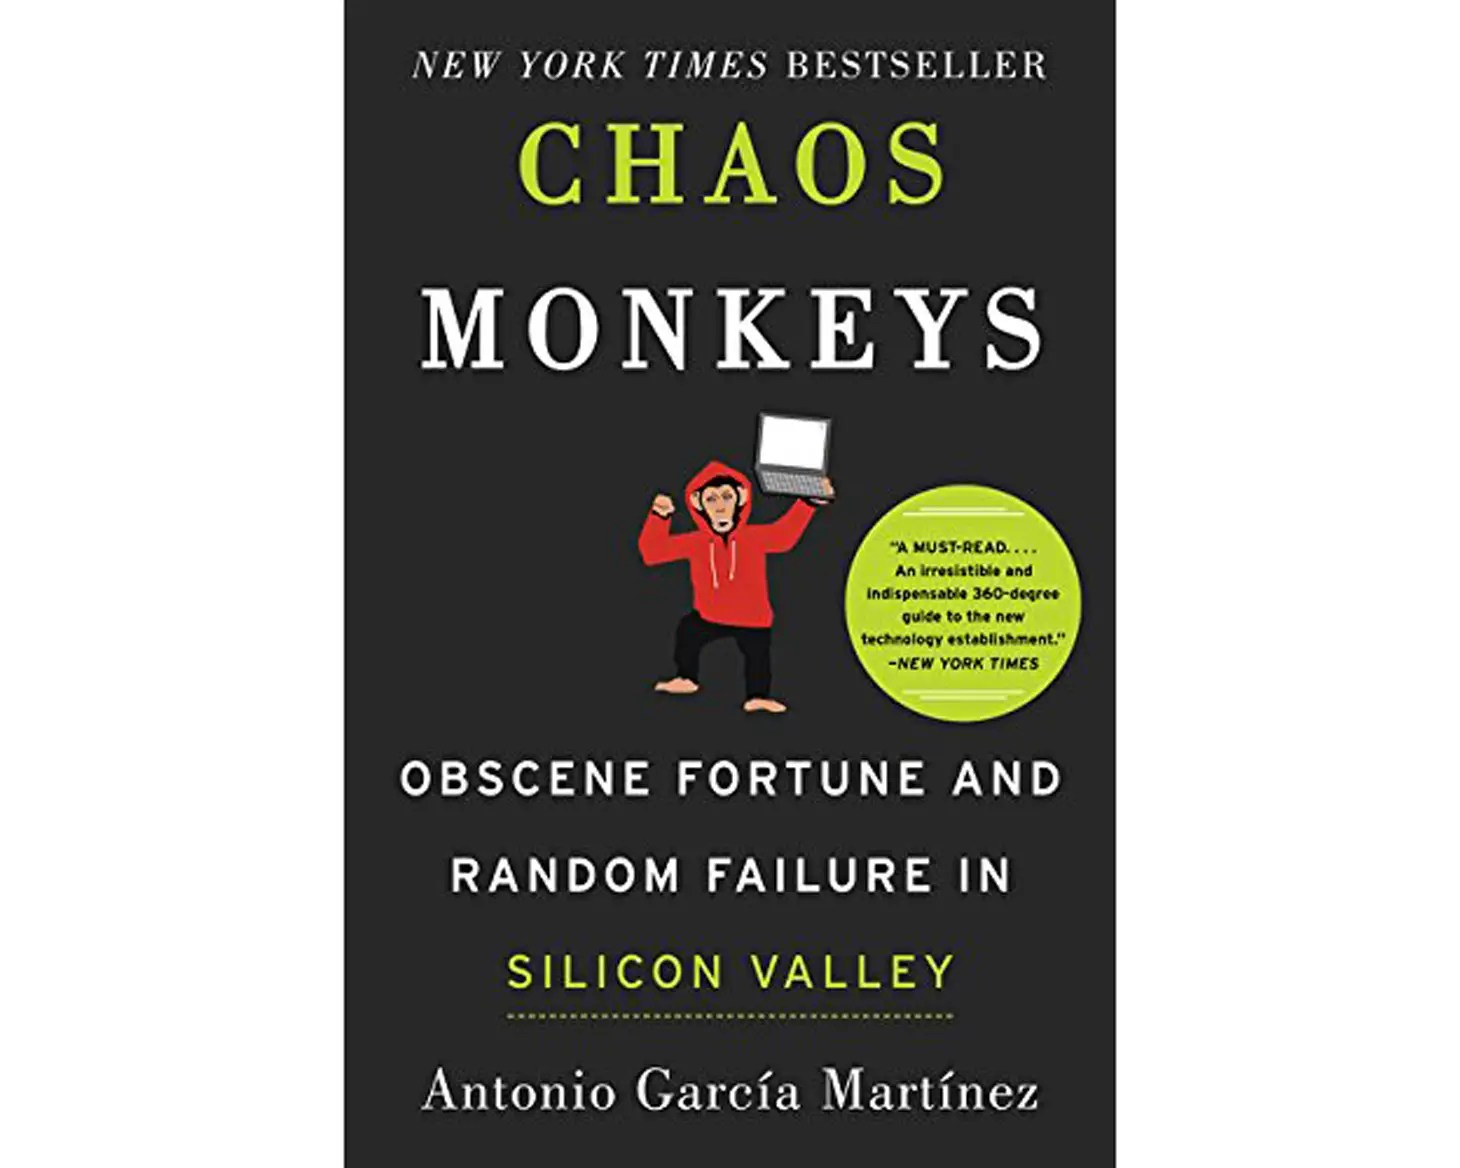 """Chaos Monkeys: Obscene Fortune and Random Failure in Silicon Valley"" by Antonio Garcia Martinez"